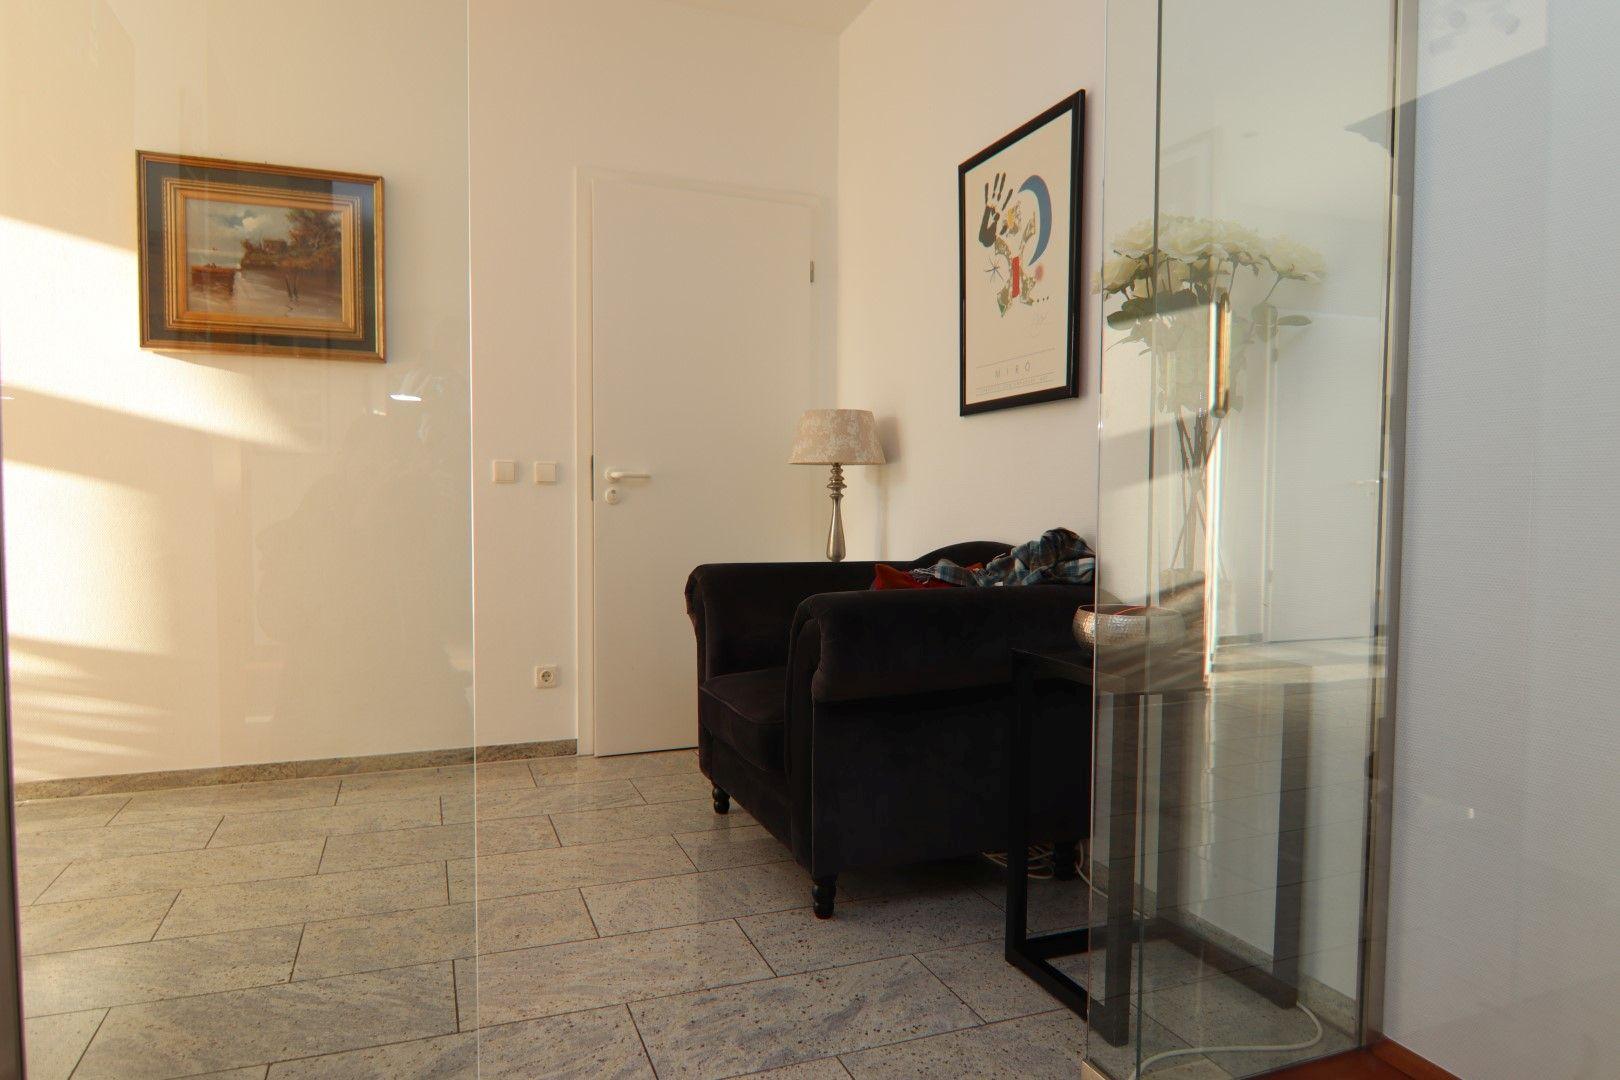 Immobilie Nr.0275 | Hauptstraße 46, 40668 Meerbusch - Lank